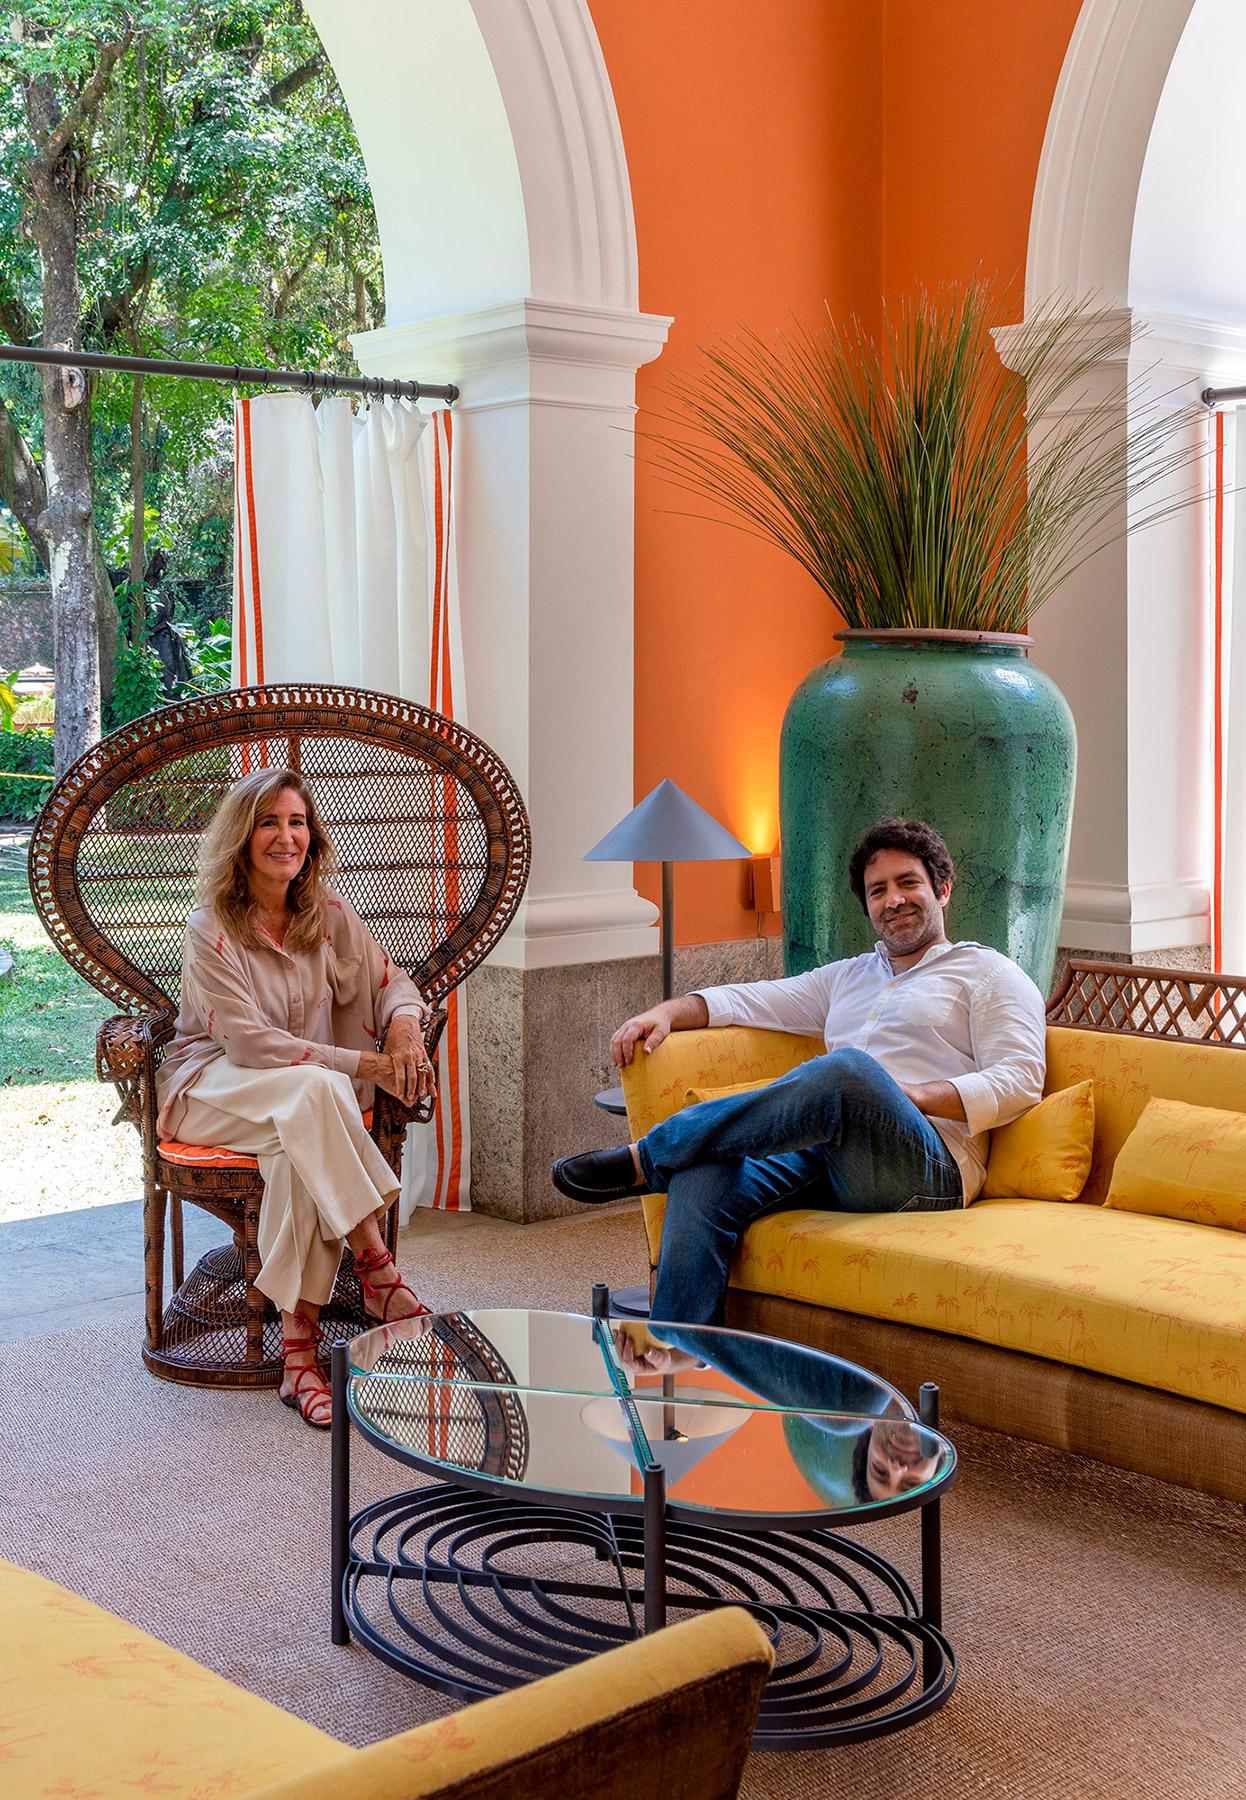 Cynthia Berlandez Pedrosa e Raphael Pedrosa Zay